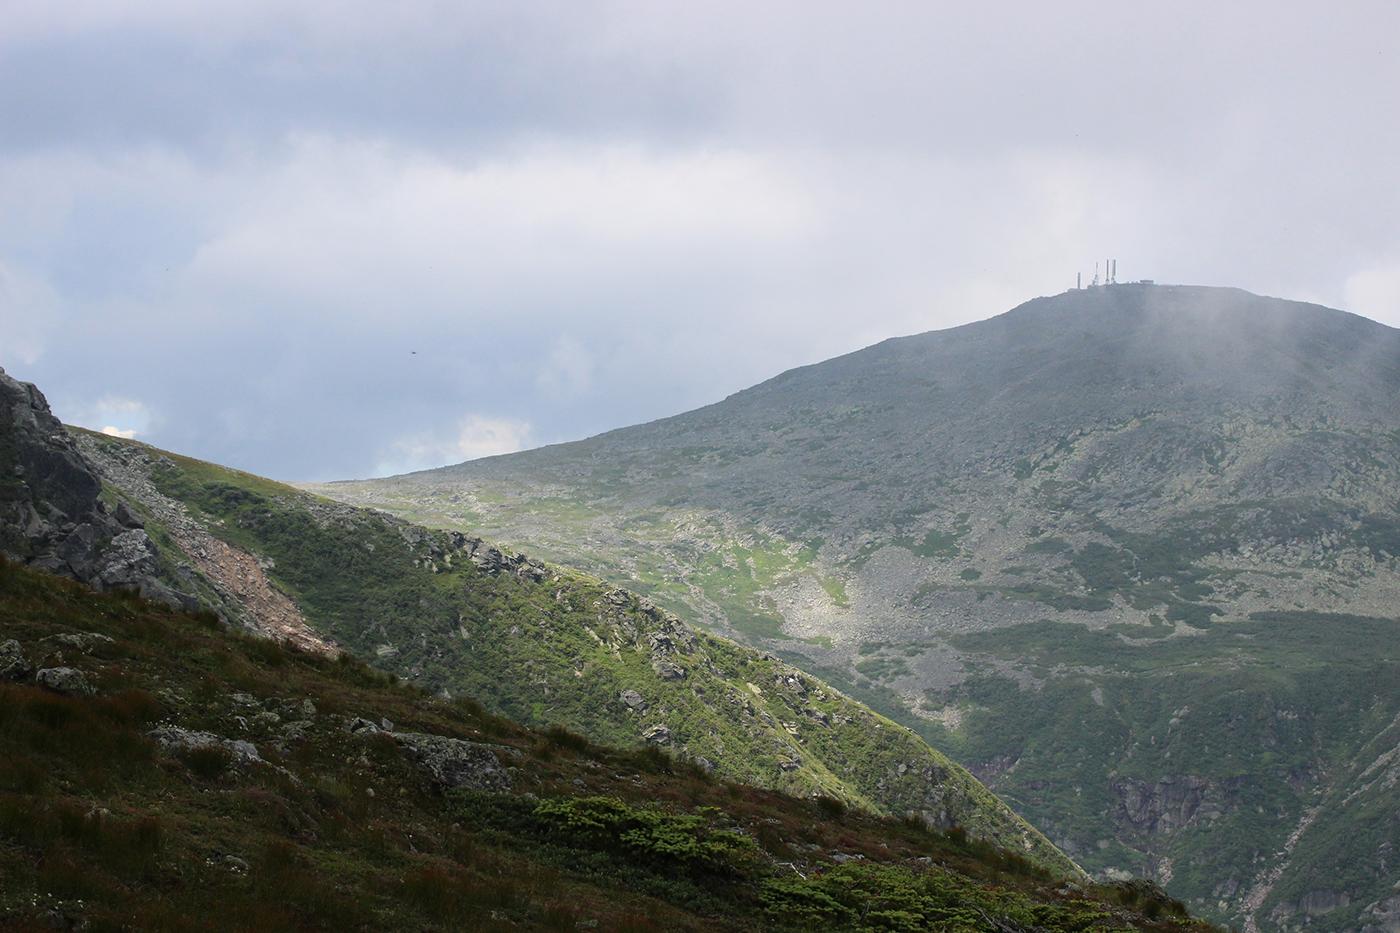 beginner hiking mistakes